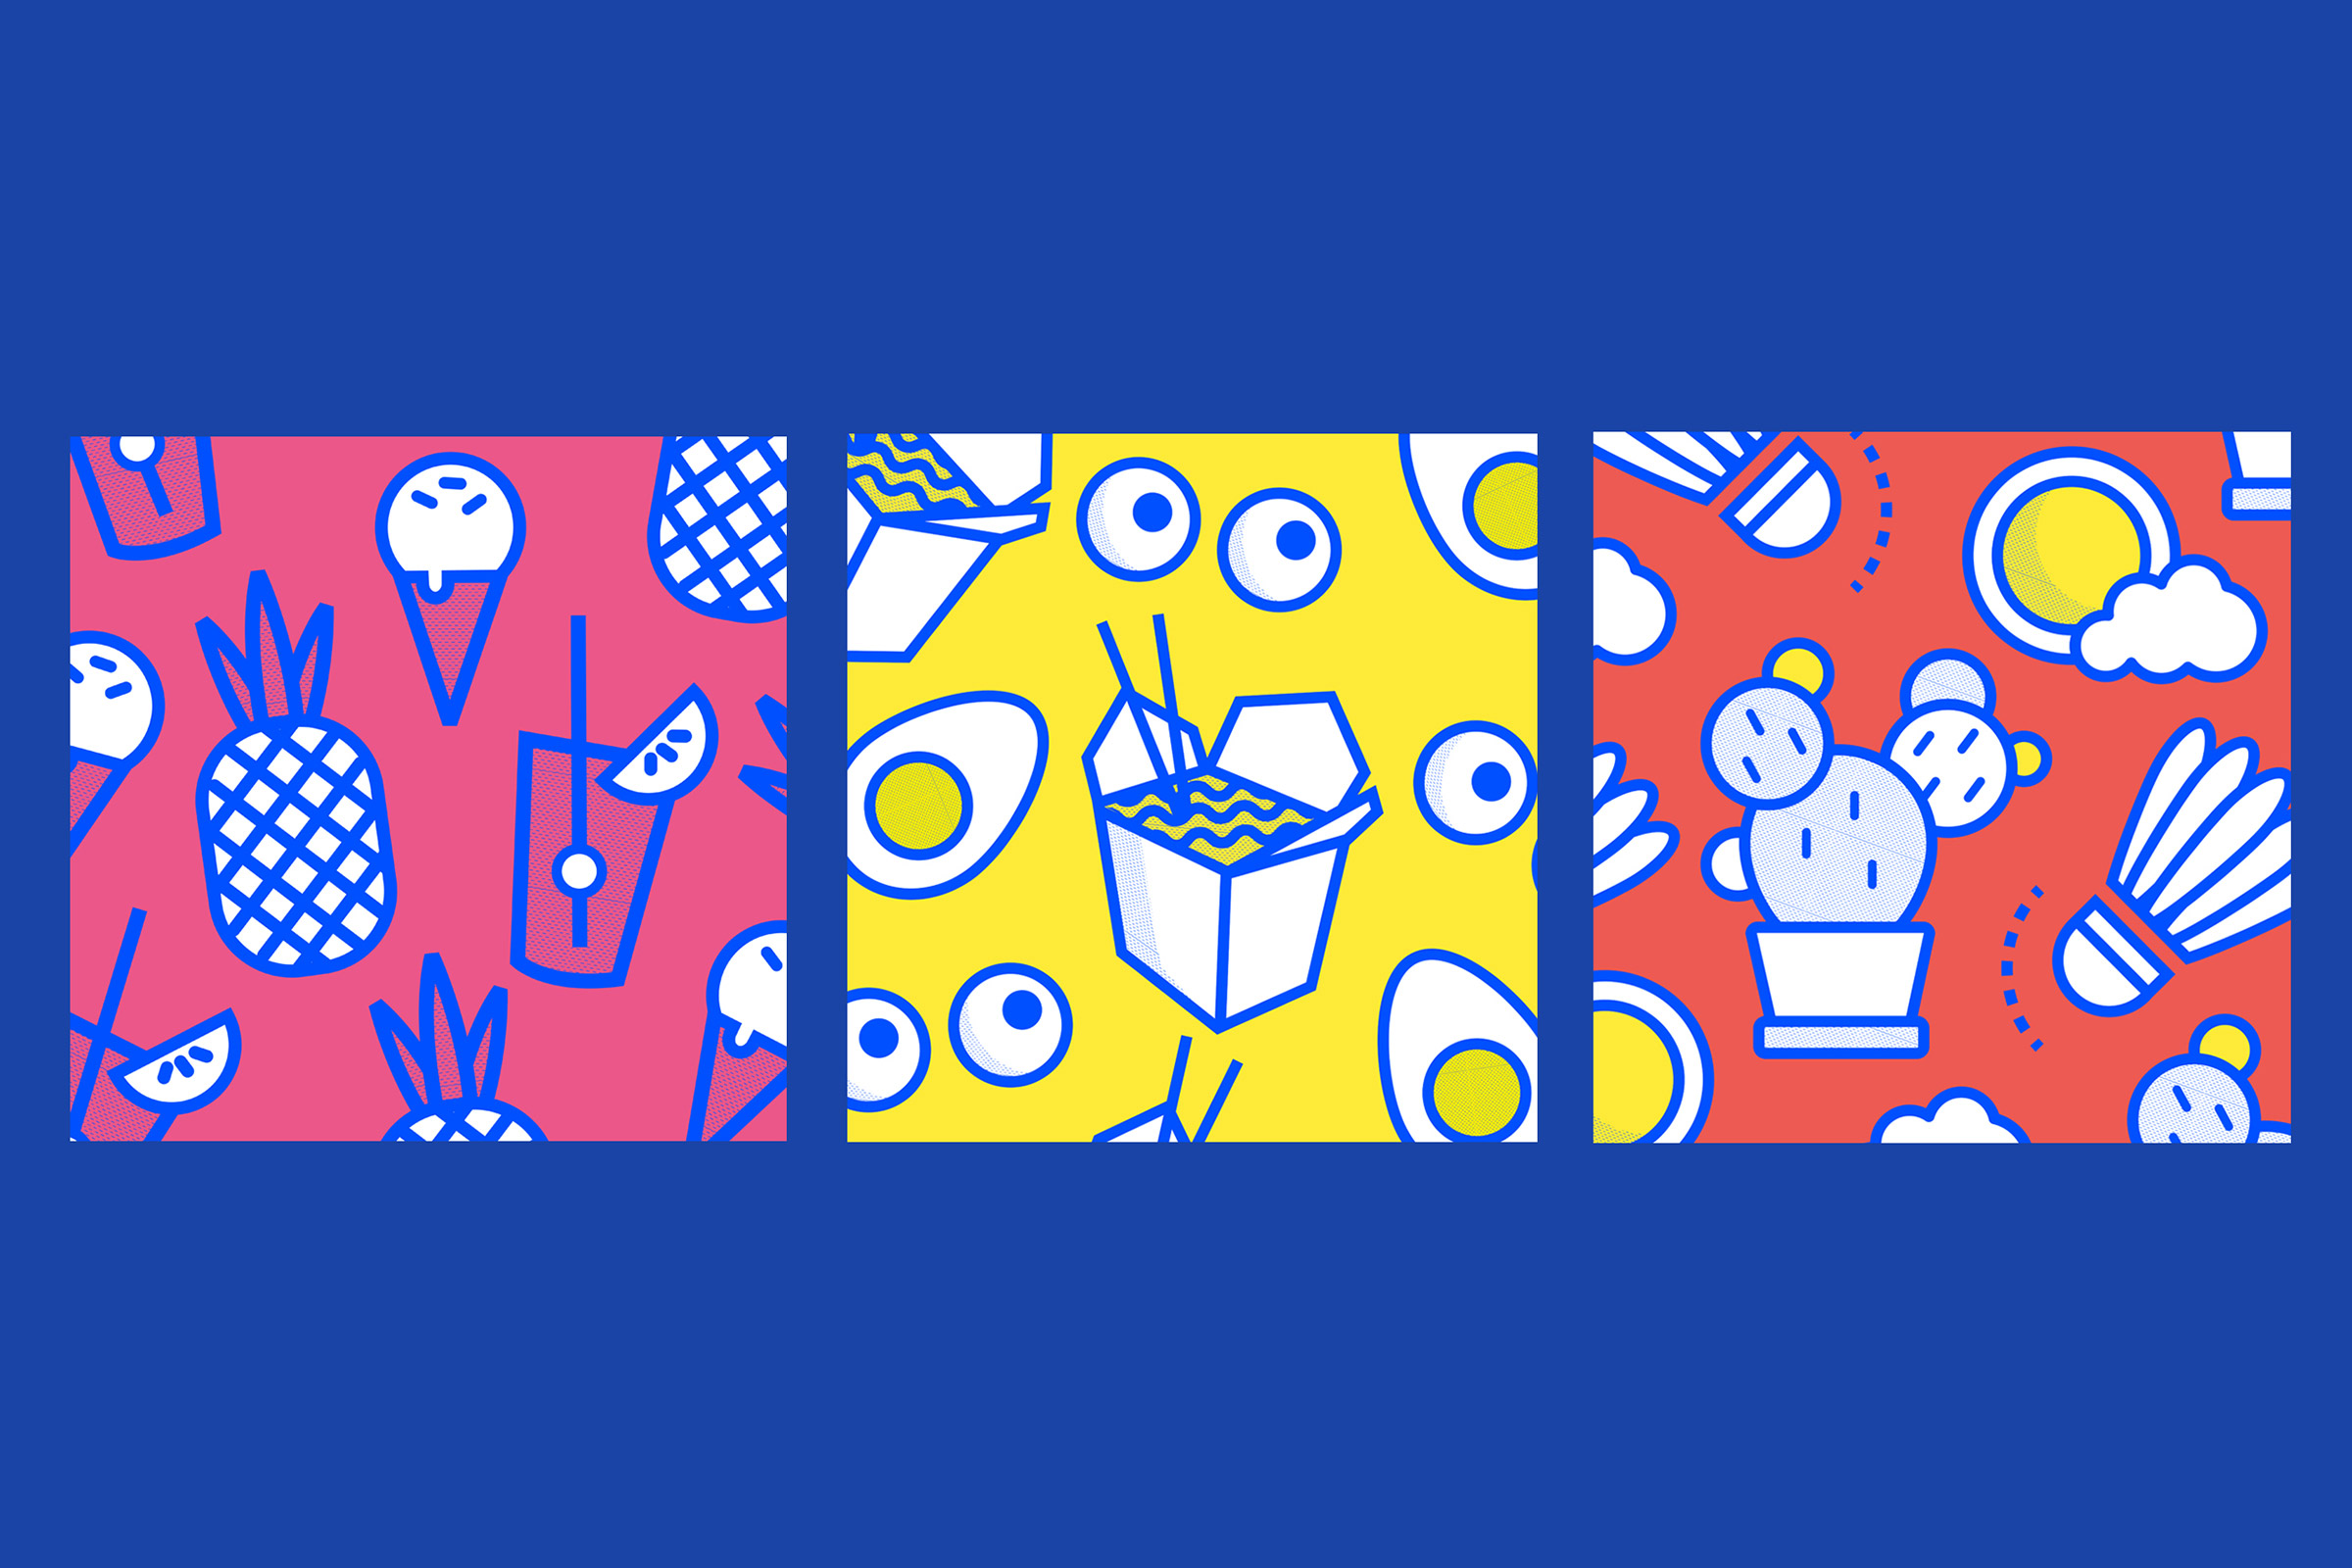 Illustrationsdesign von KittoKatsu, Agentur Corporate Design